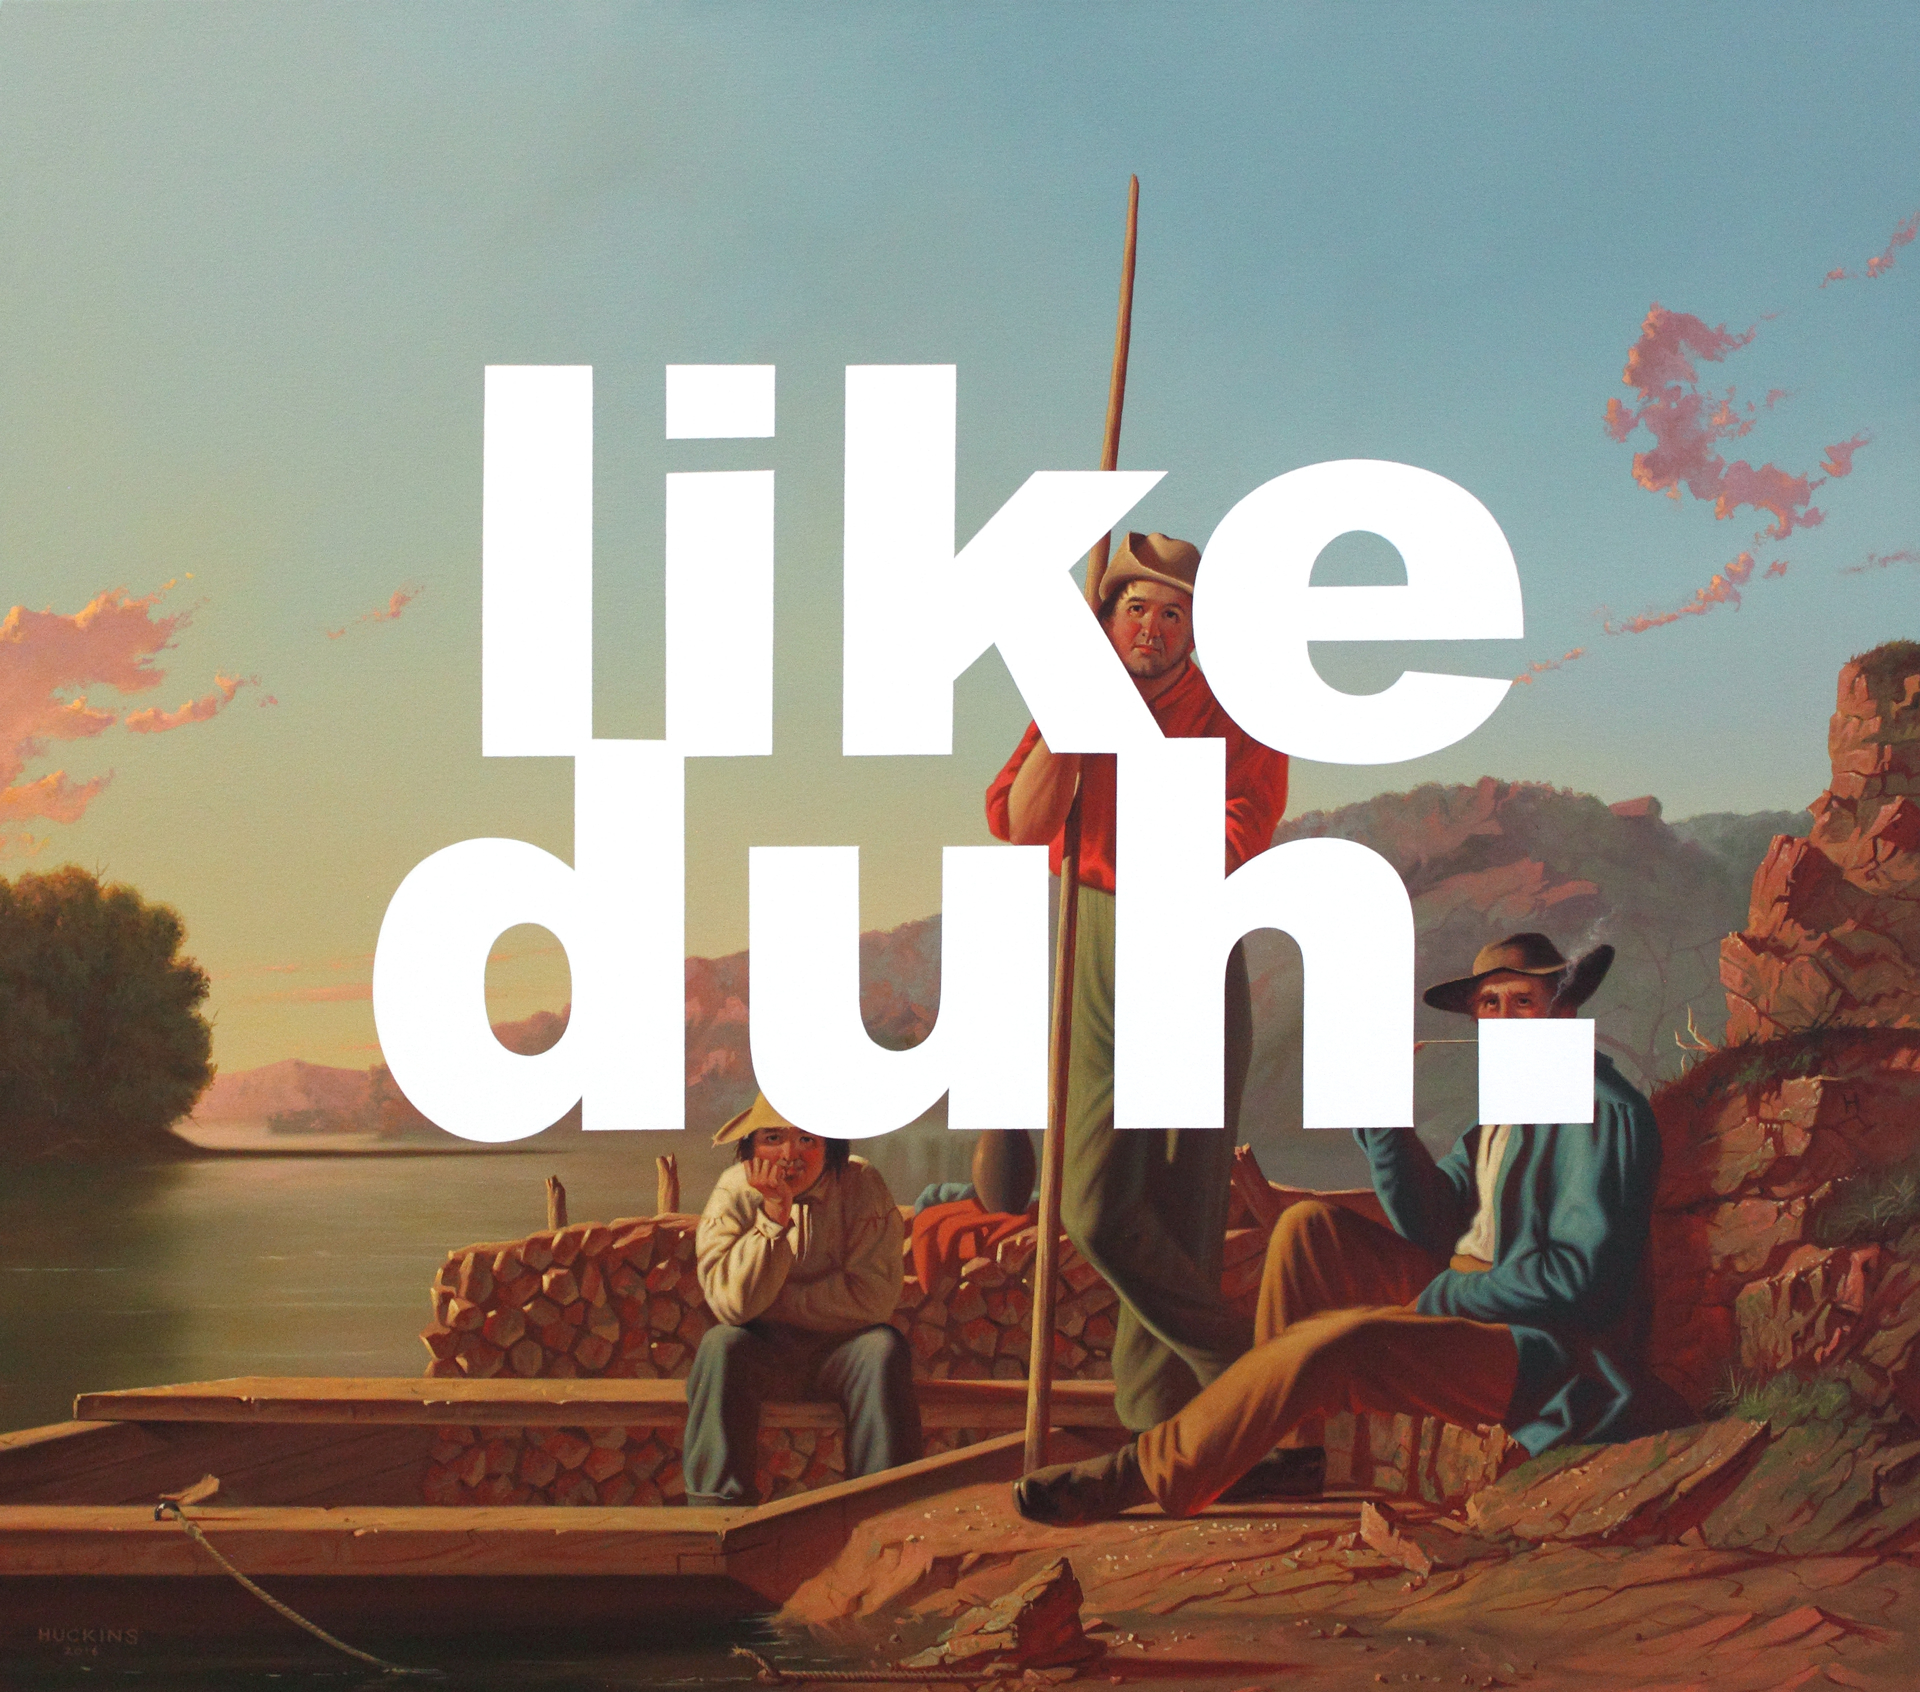 The Wood-Boat: Like Duh  by Shawn Huckins